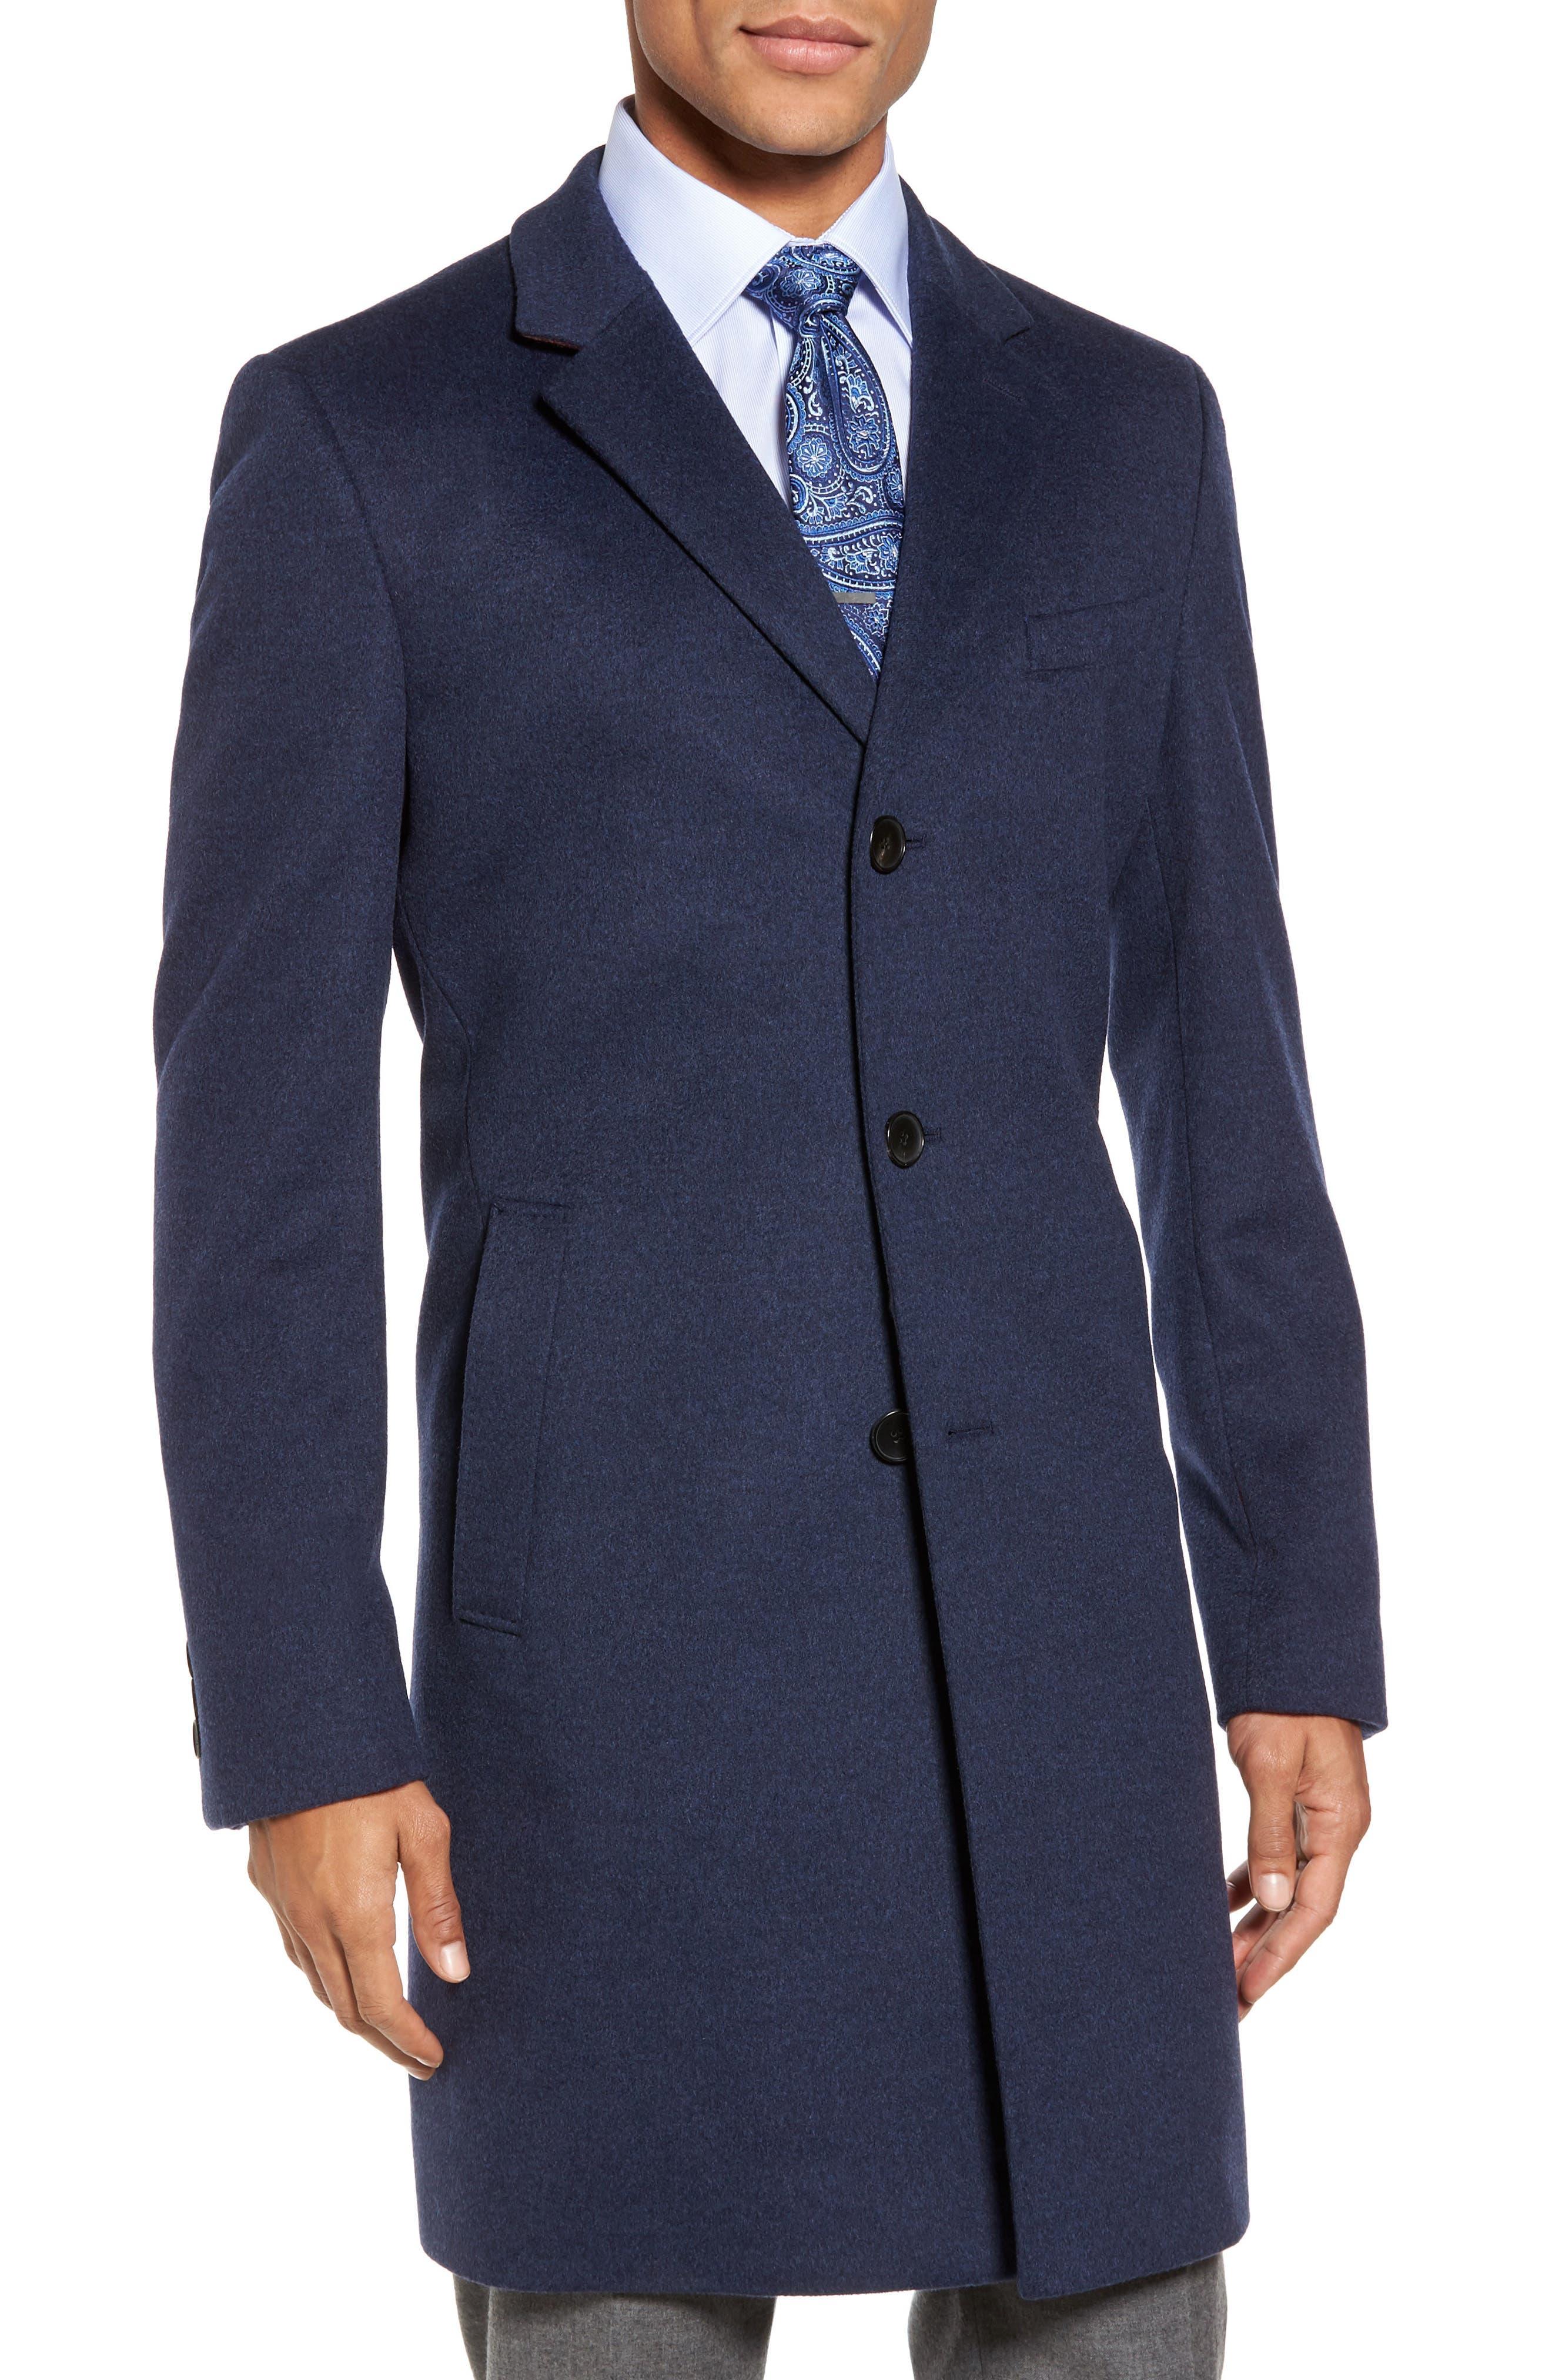 Nye Wool & Cashmere Topcoat,                             Main thumbnail 1, color,                             430